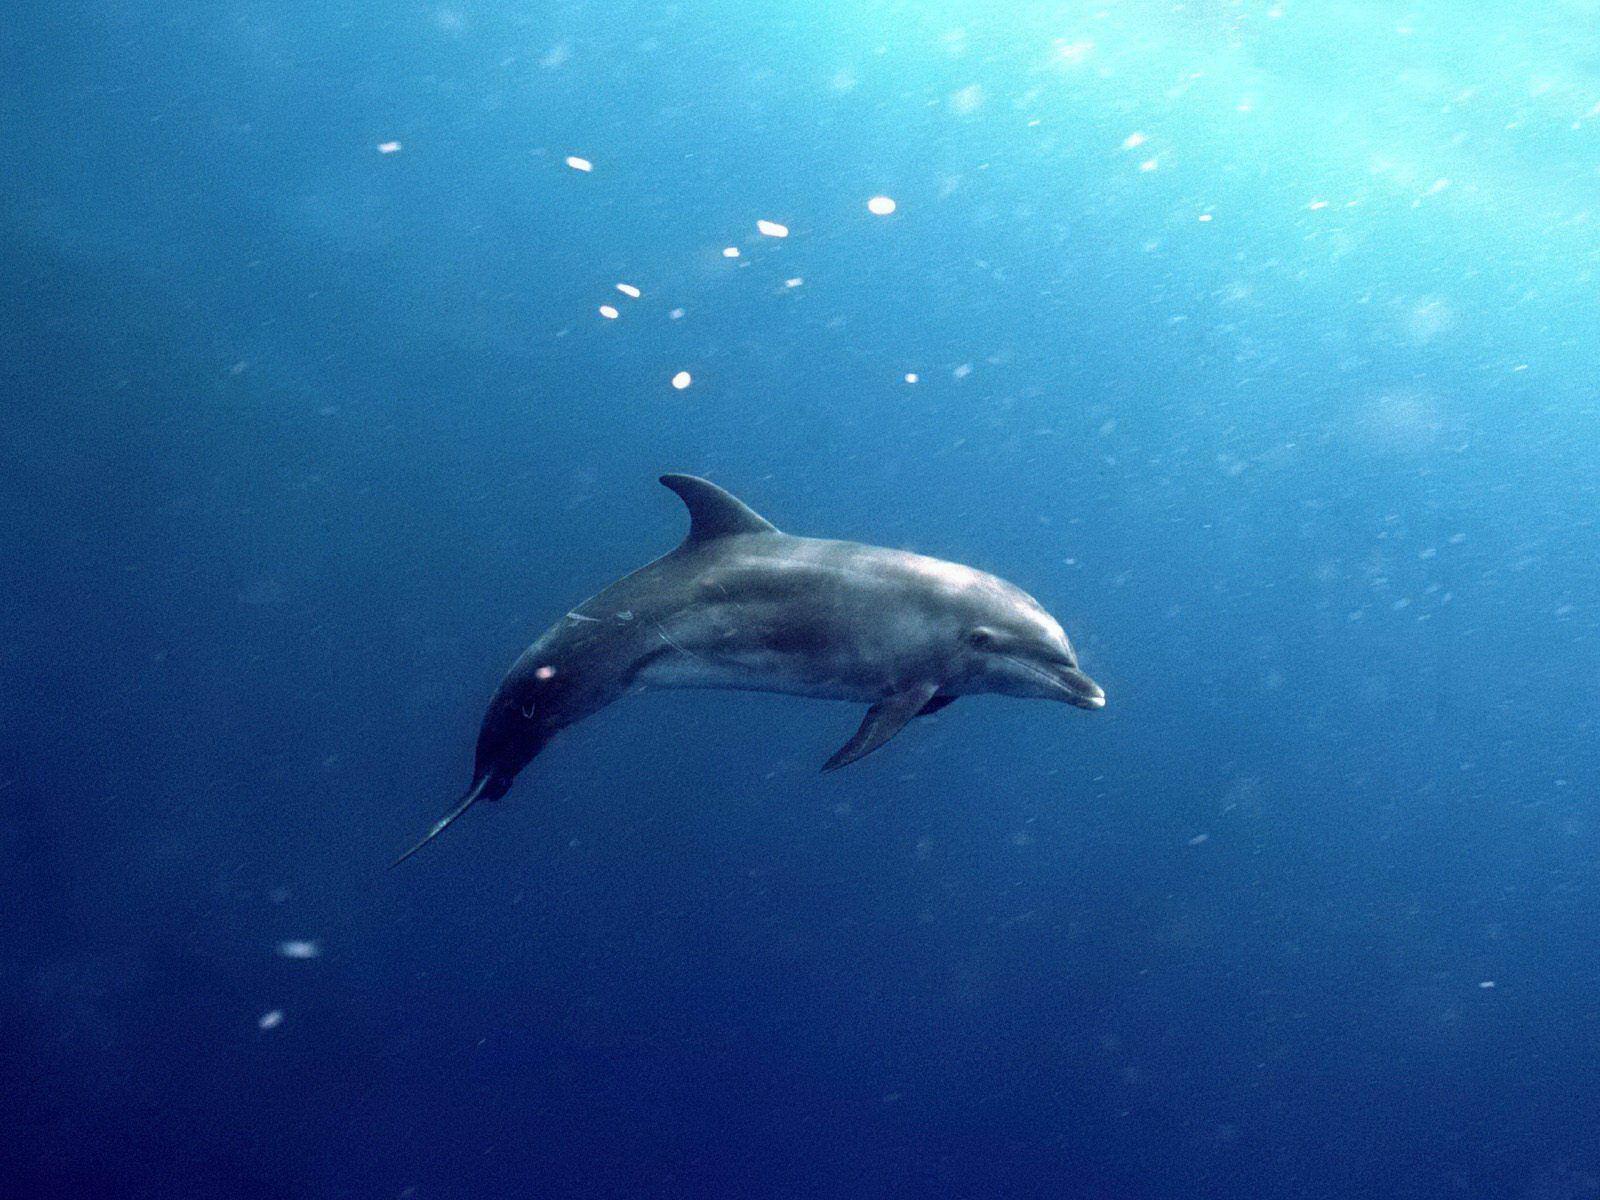 http://4.bp.blogspot.com/-QyzbPuKWY4U/UBVChX9HdpI/AAAAAAAAAYo/iNue4GHUSc0/s1600/dolphinpictures+%25286%2529.jpg